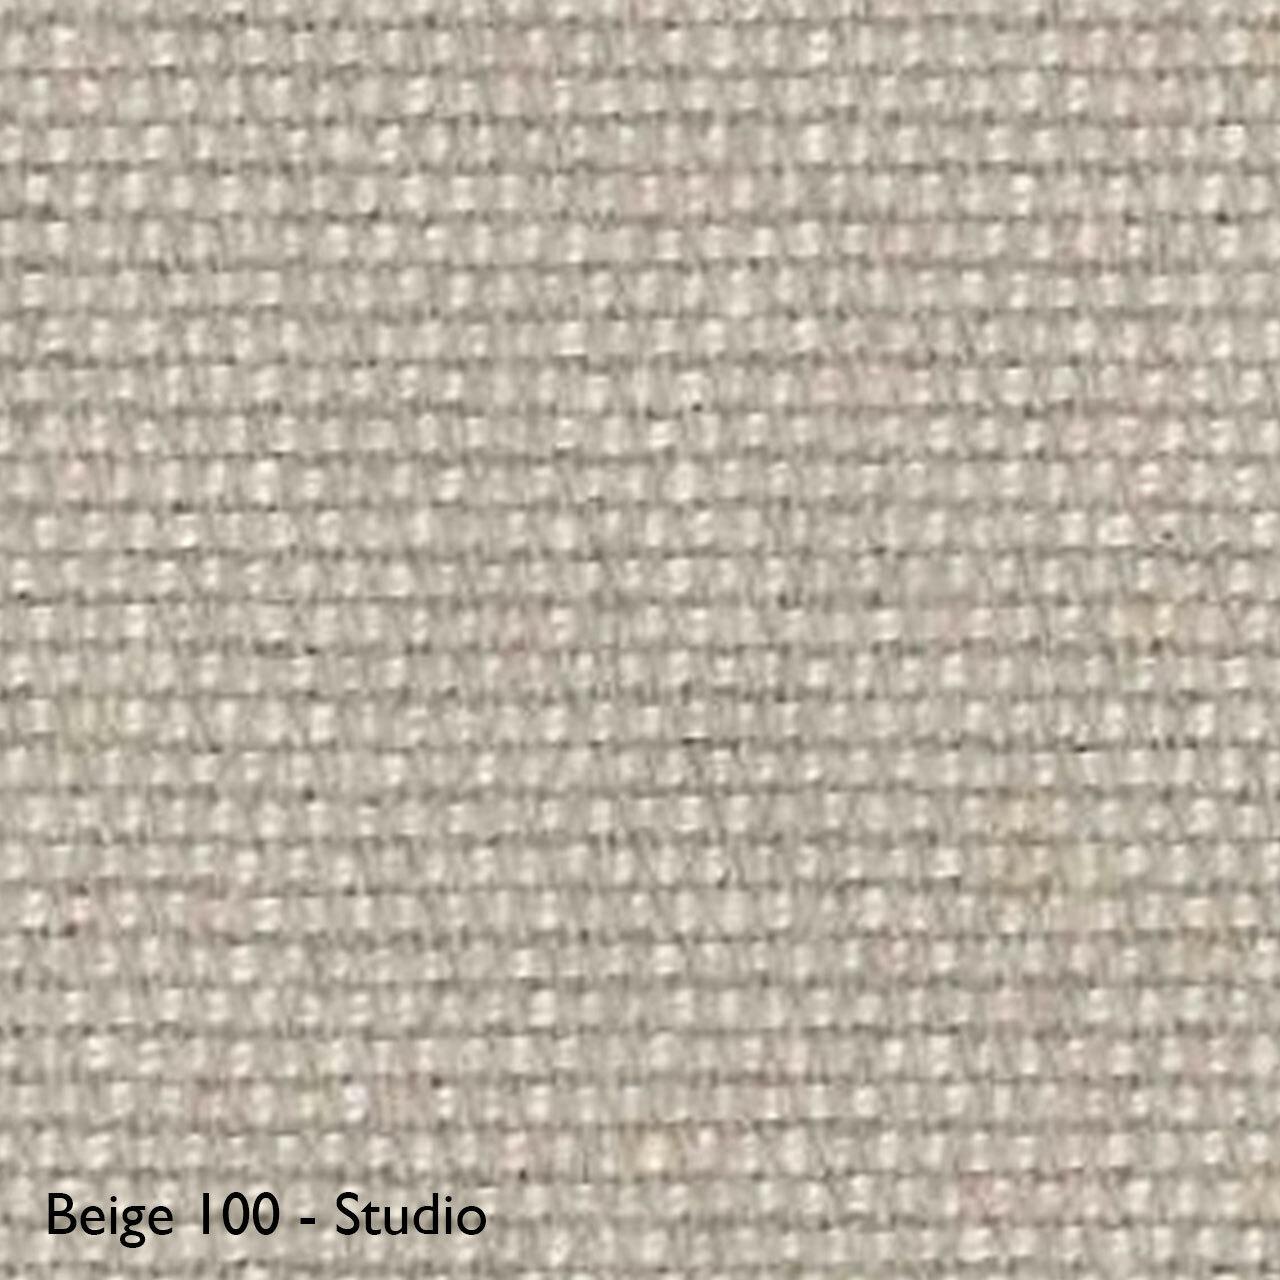 Farbkachel Blade Wendelbo Beige 100 - Studio